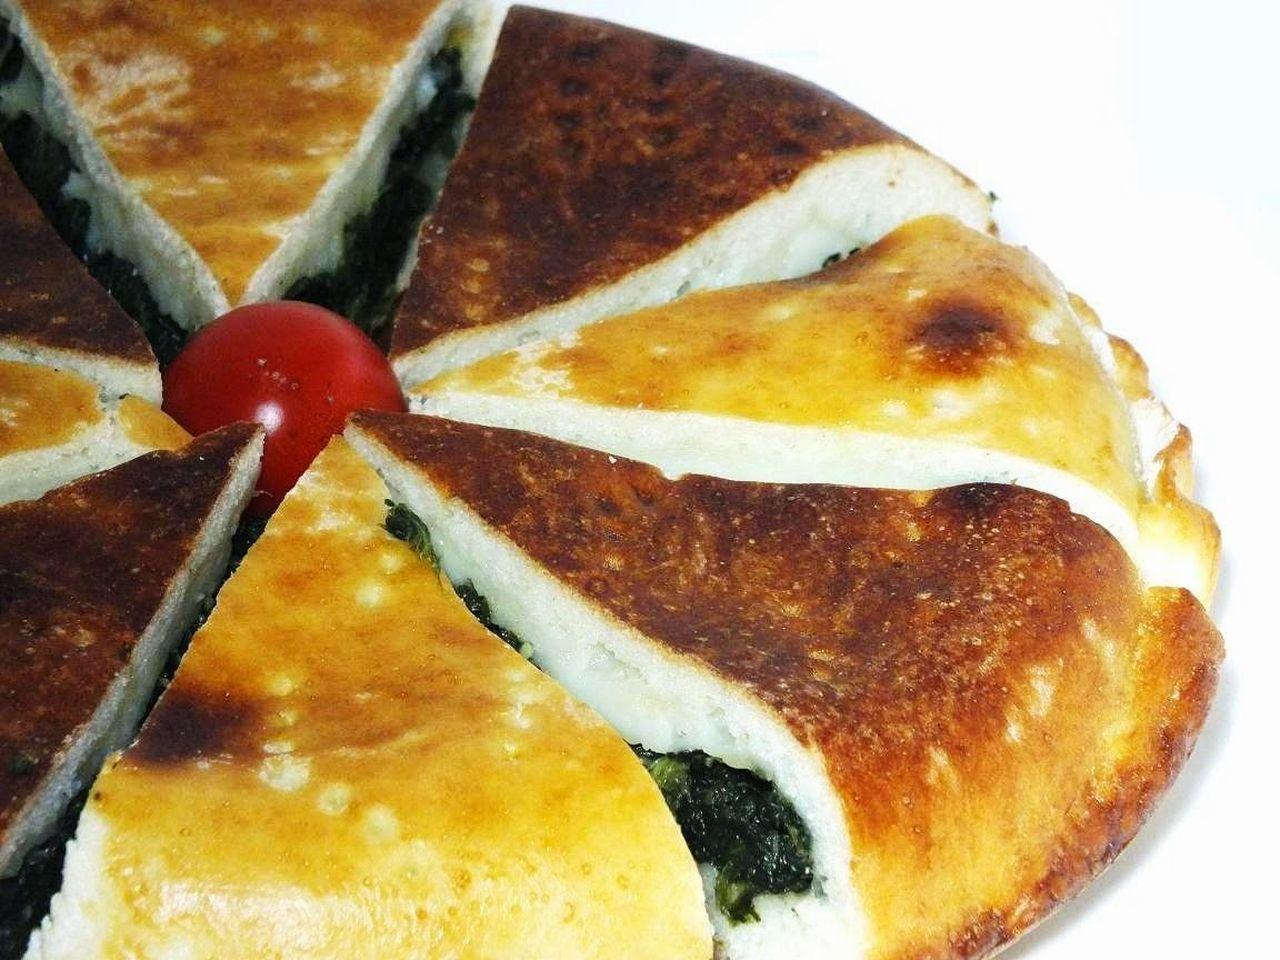 Pizzaripiena Spinaciemozzarella Italian Food Pizza🍕 Food Homemade Buonappetito